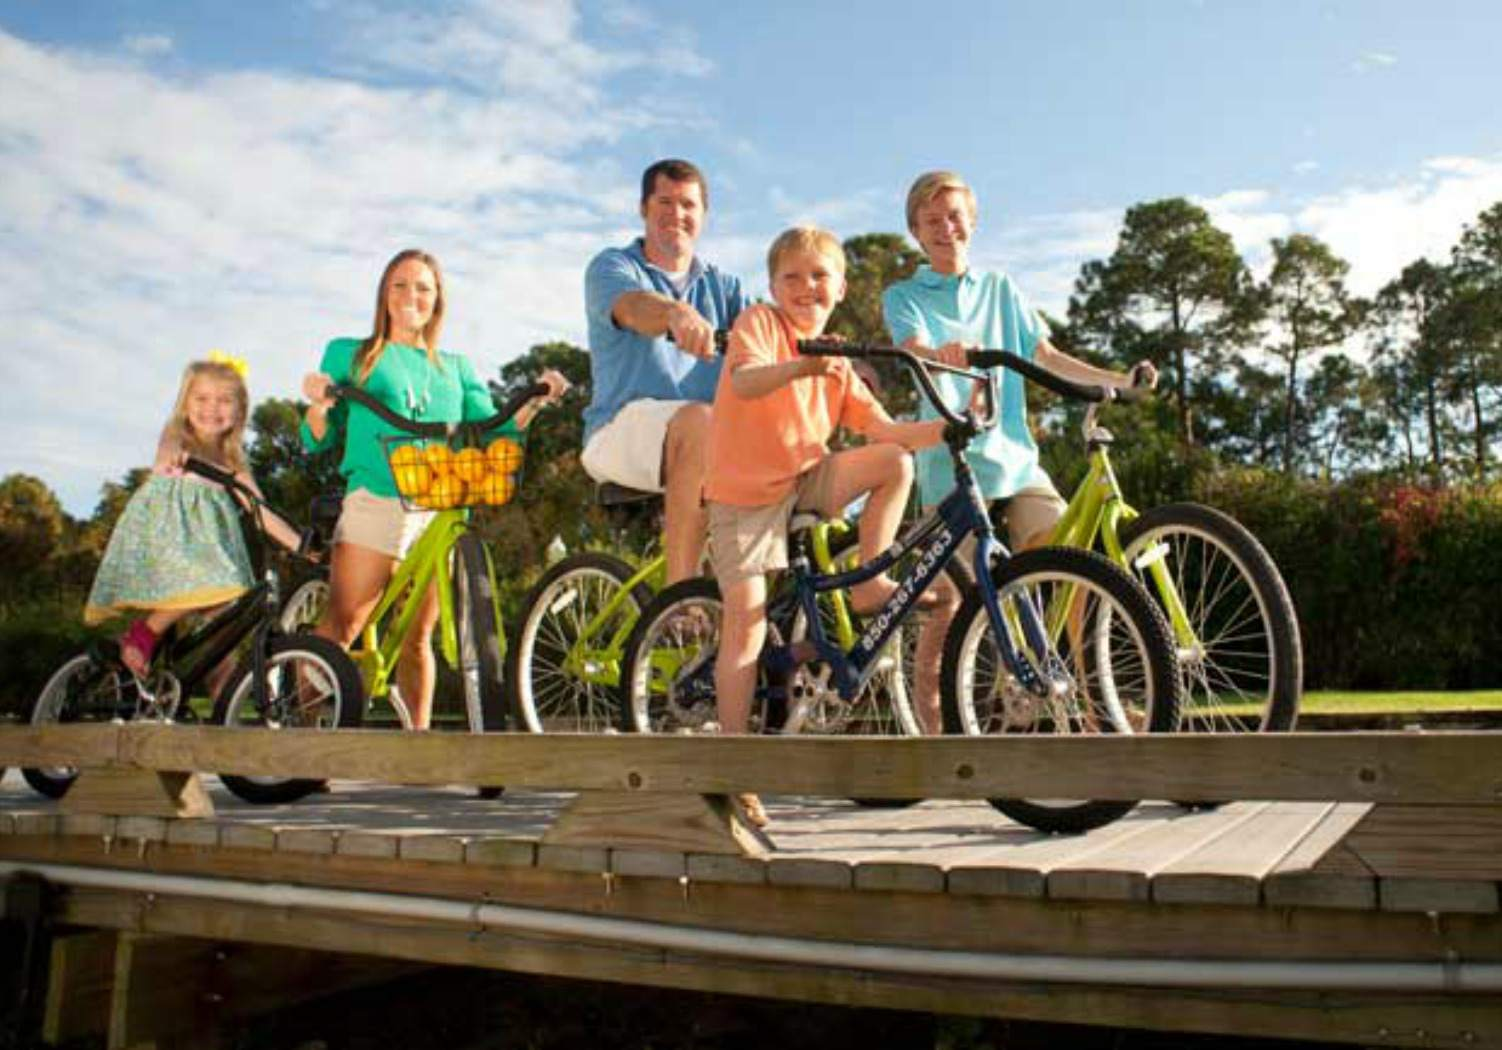 Free Bike Rentals at Sandesting Golf and Beach Resort